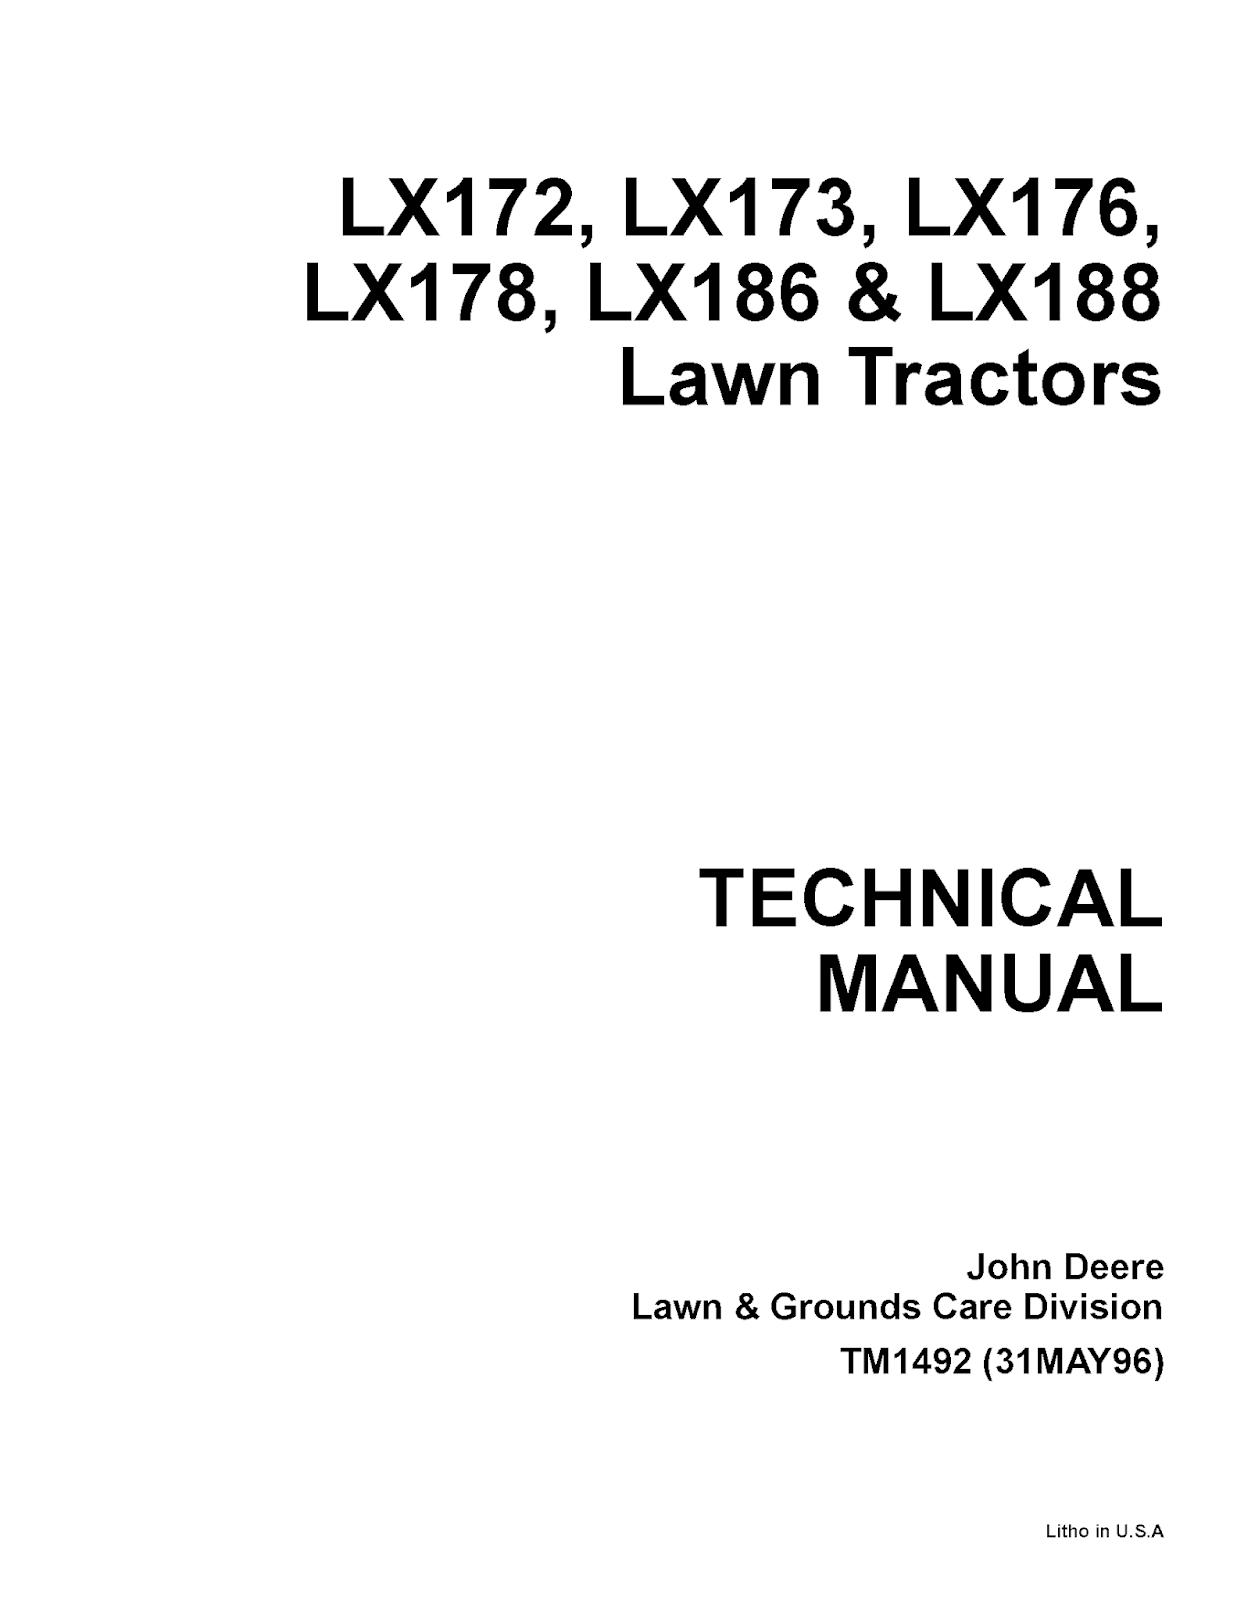 [SCHEMATICS_44OR]  John Deere LX173 Manual | John Deere Lx173 Wiring Diagram |  | Ayra - blogger